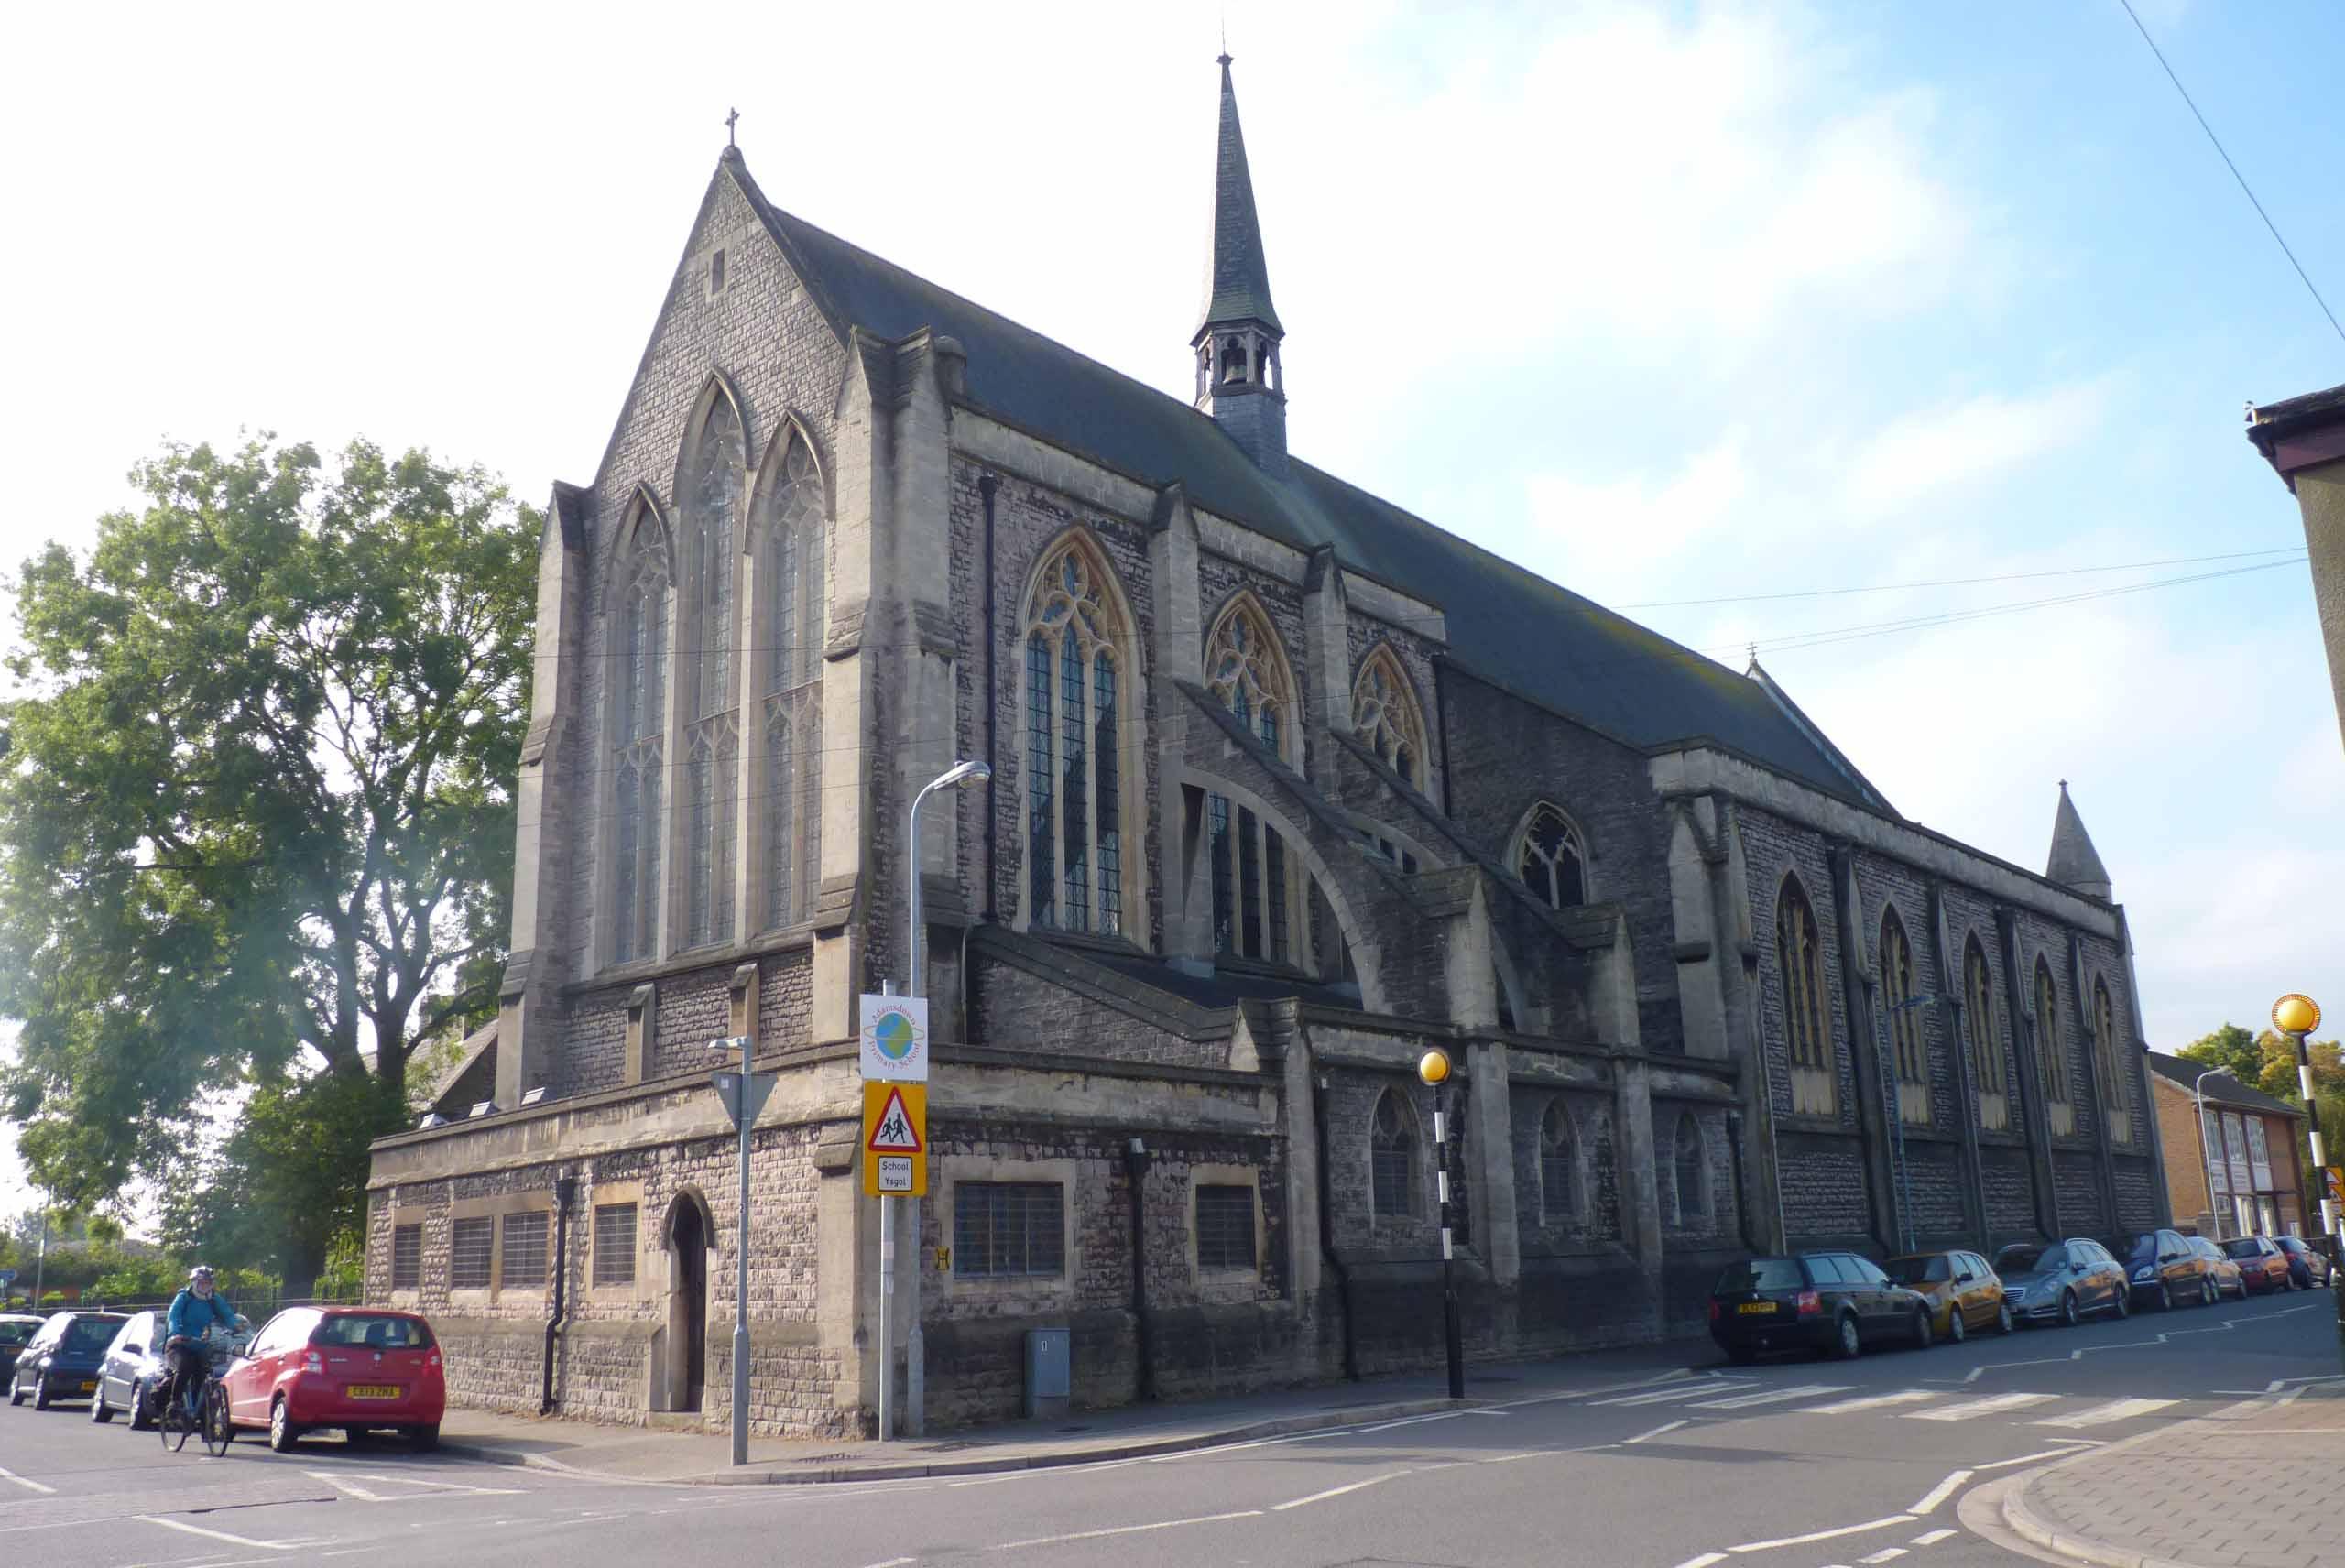 St German, Cardiff, Wales